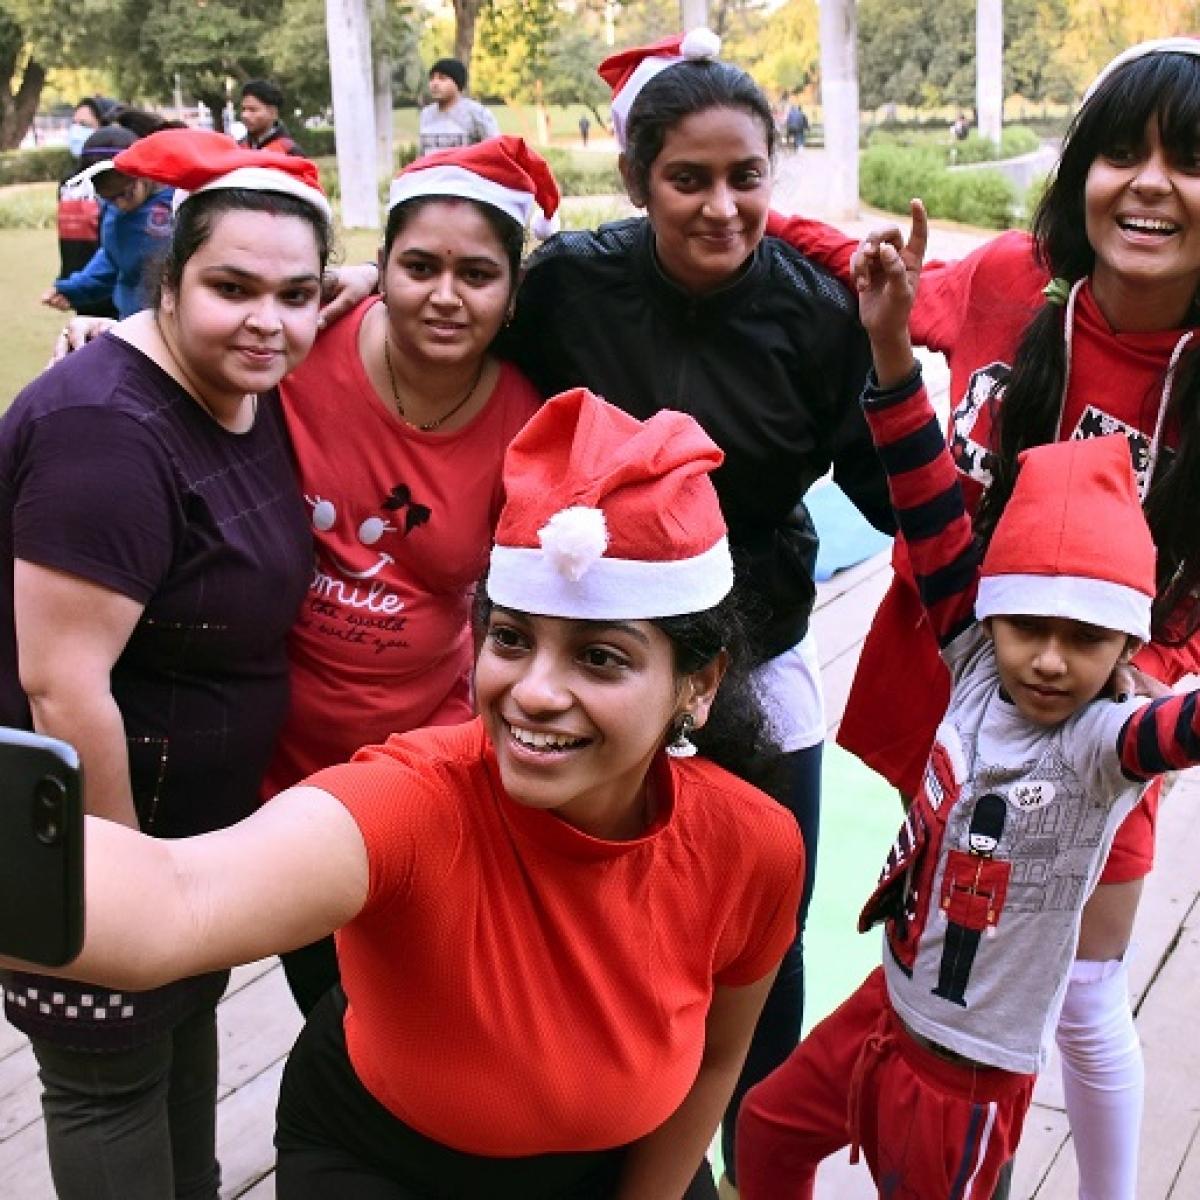 Christmas 2020: Spreading festive cheer amid coronavirus pandemic